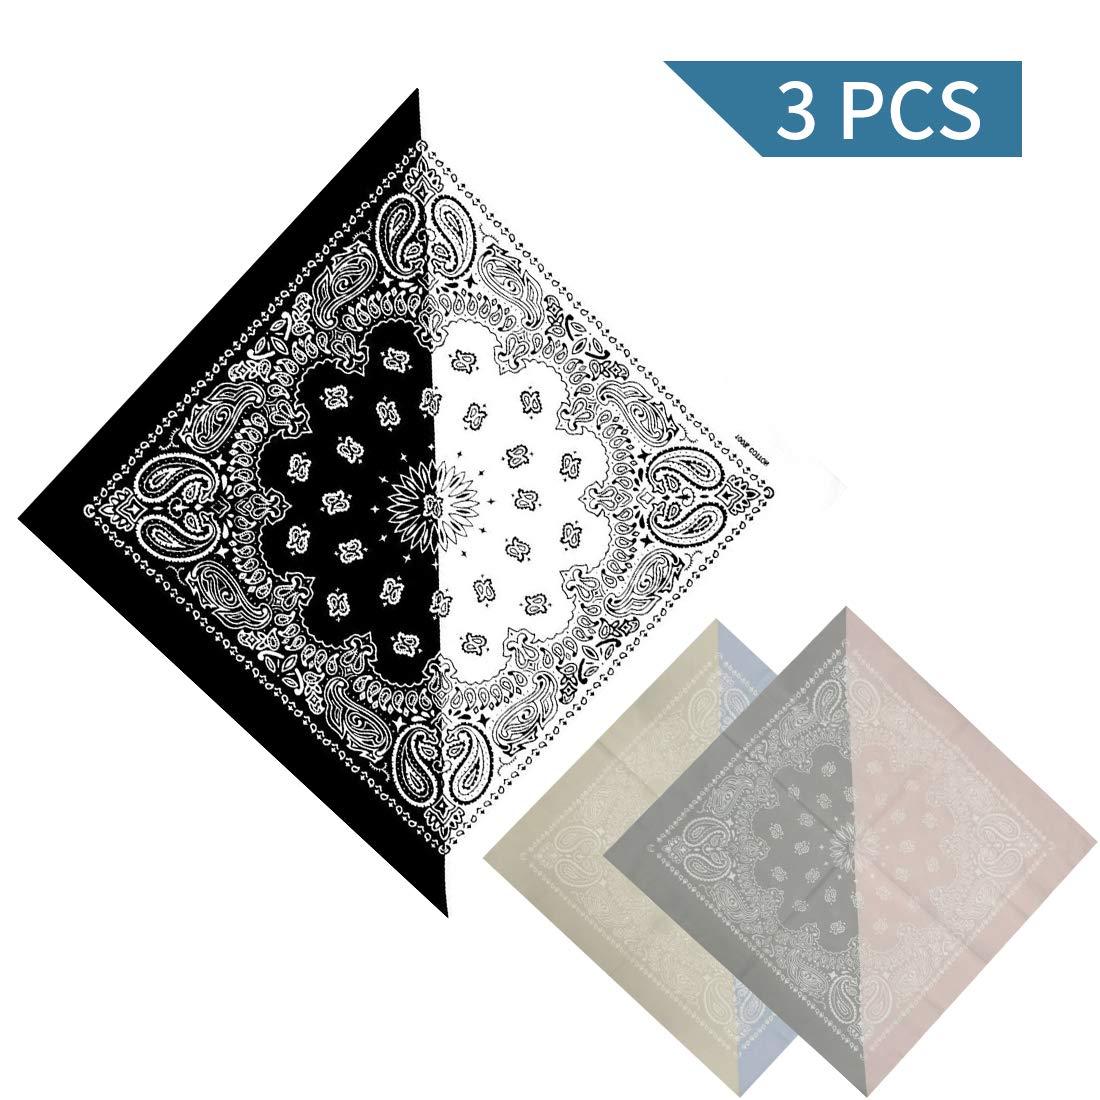 Bandanas 100% Cotton Paisley Print Scarf Wristband - Set of 3